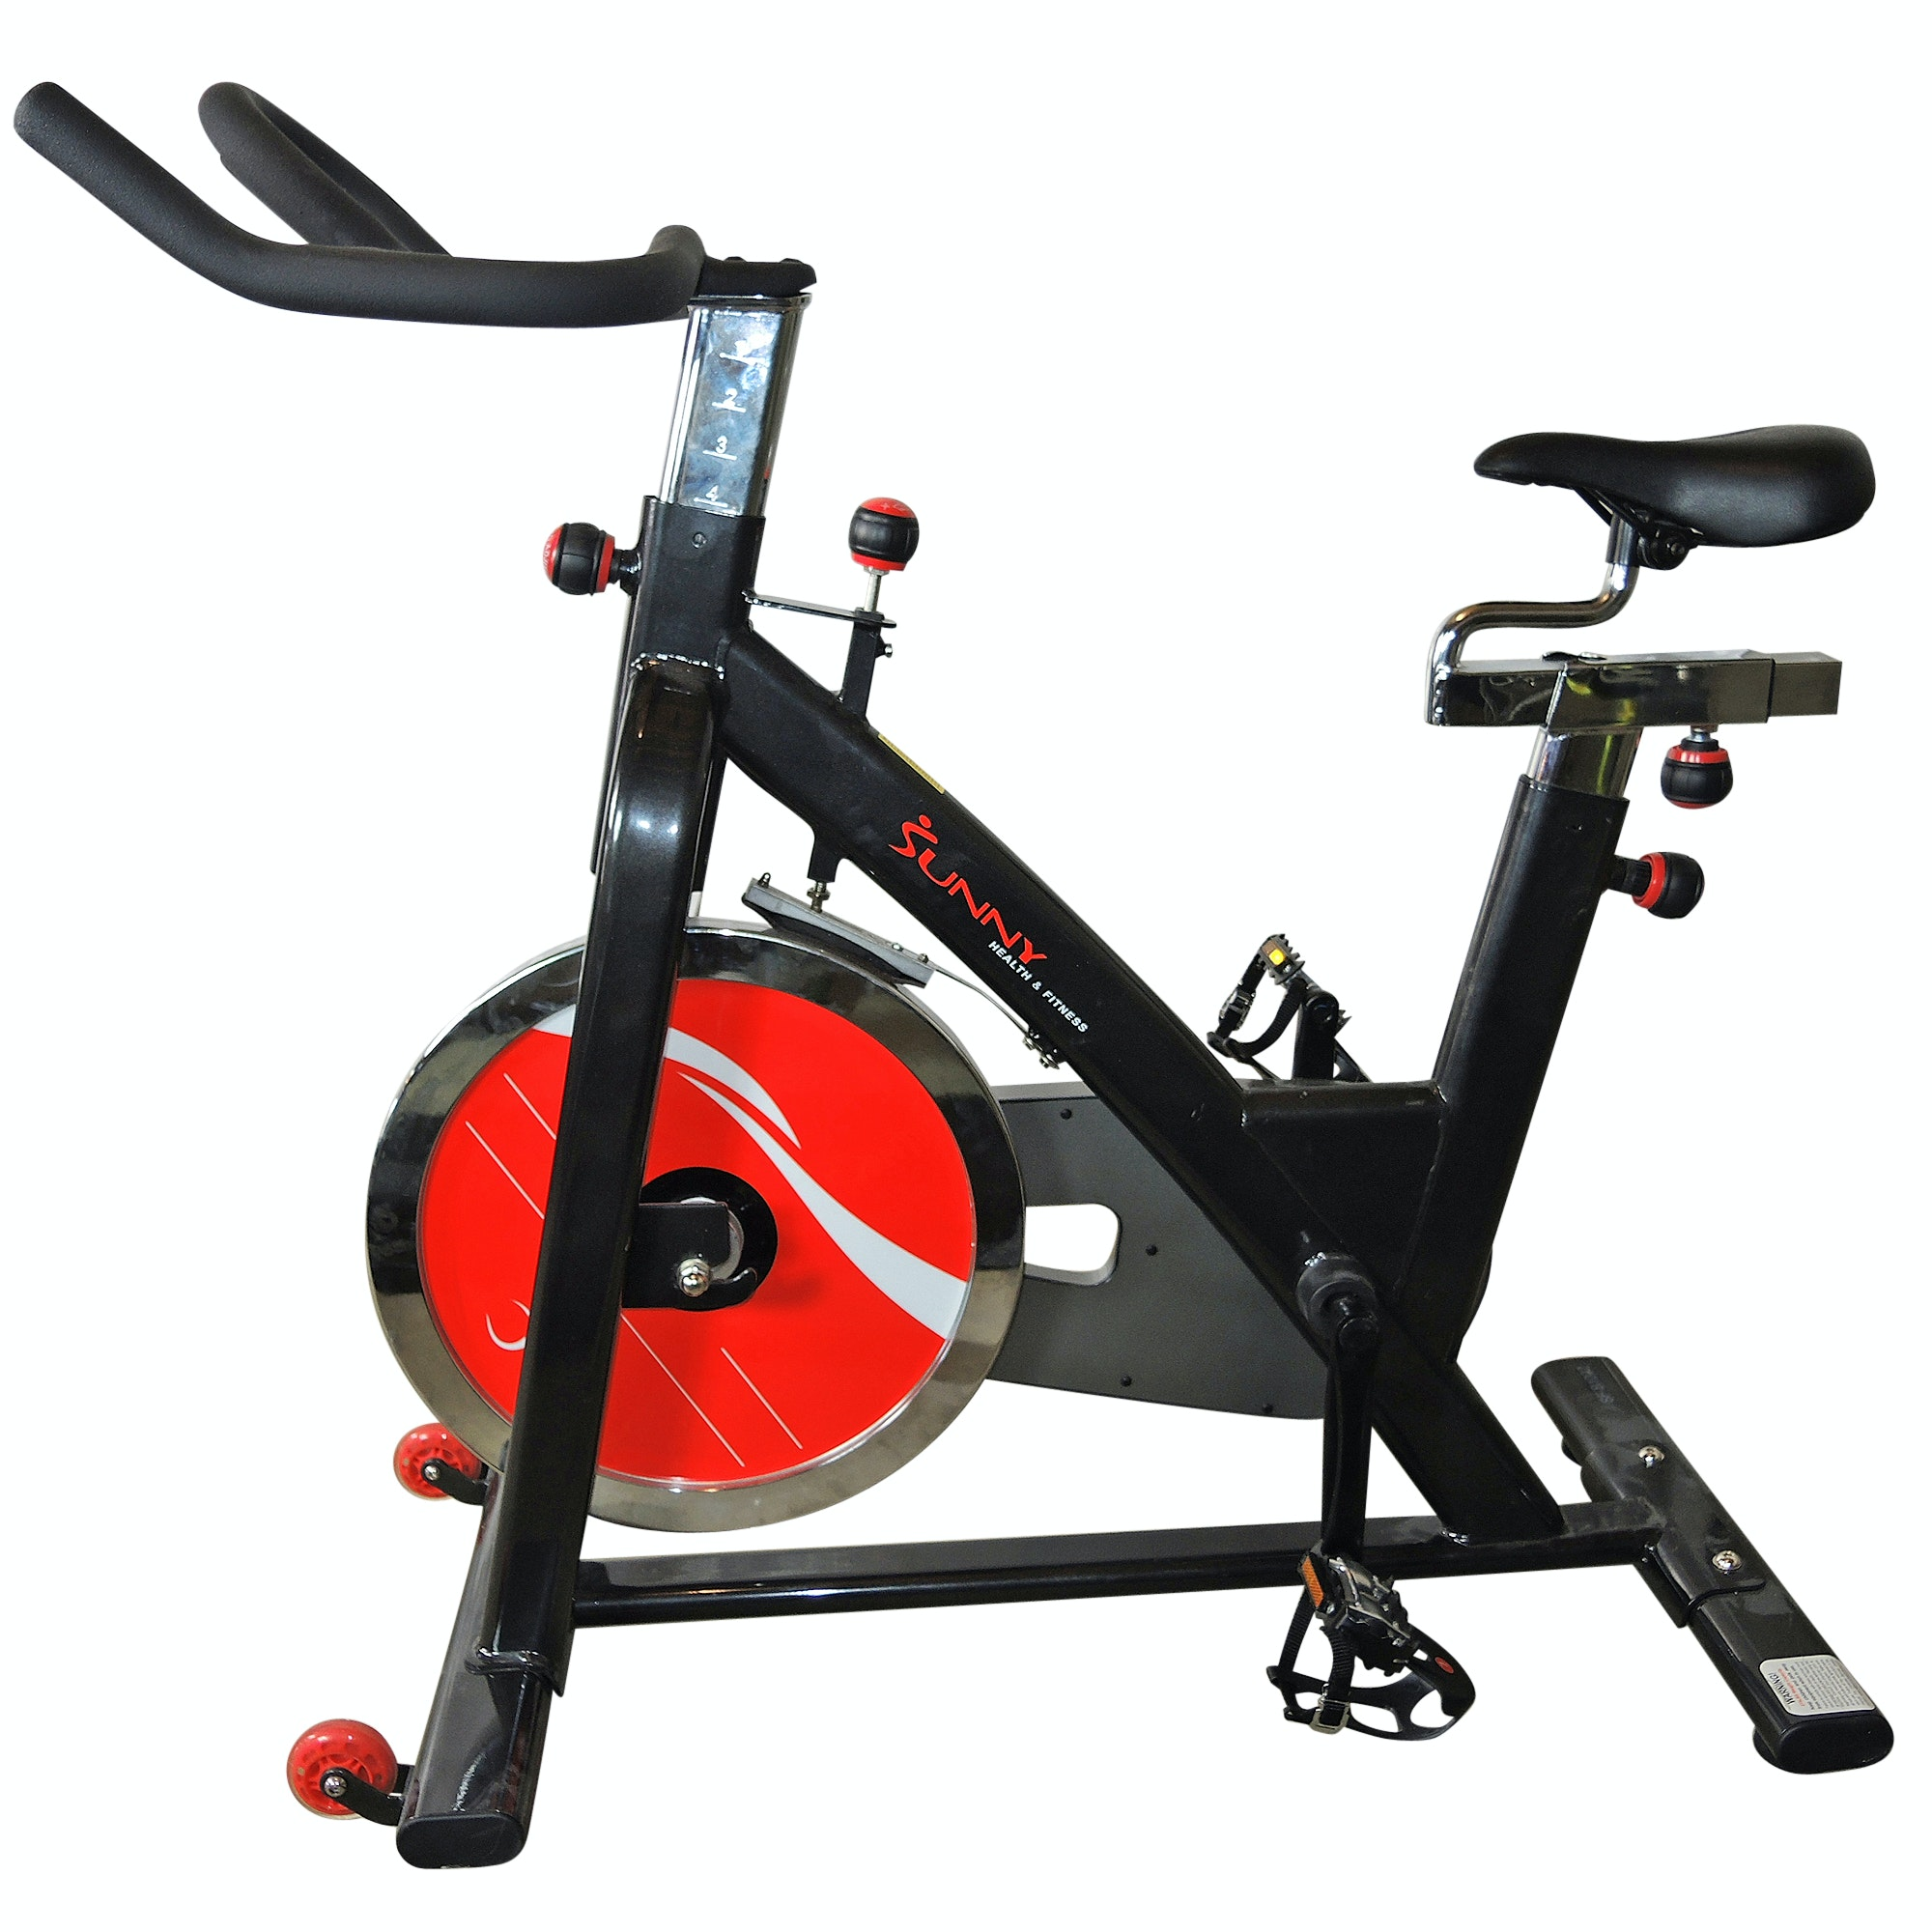 Sunny Fitness Spin Bike